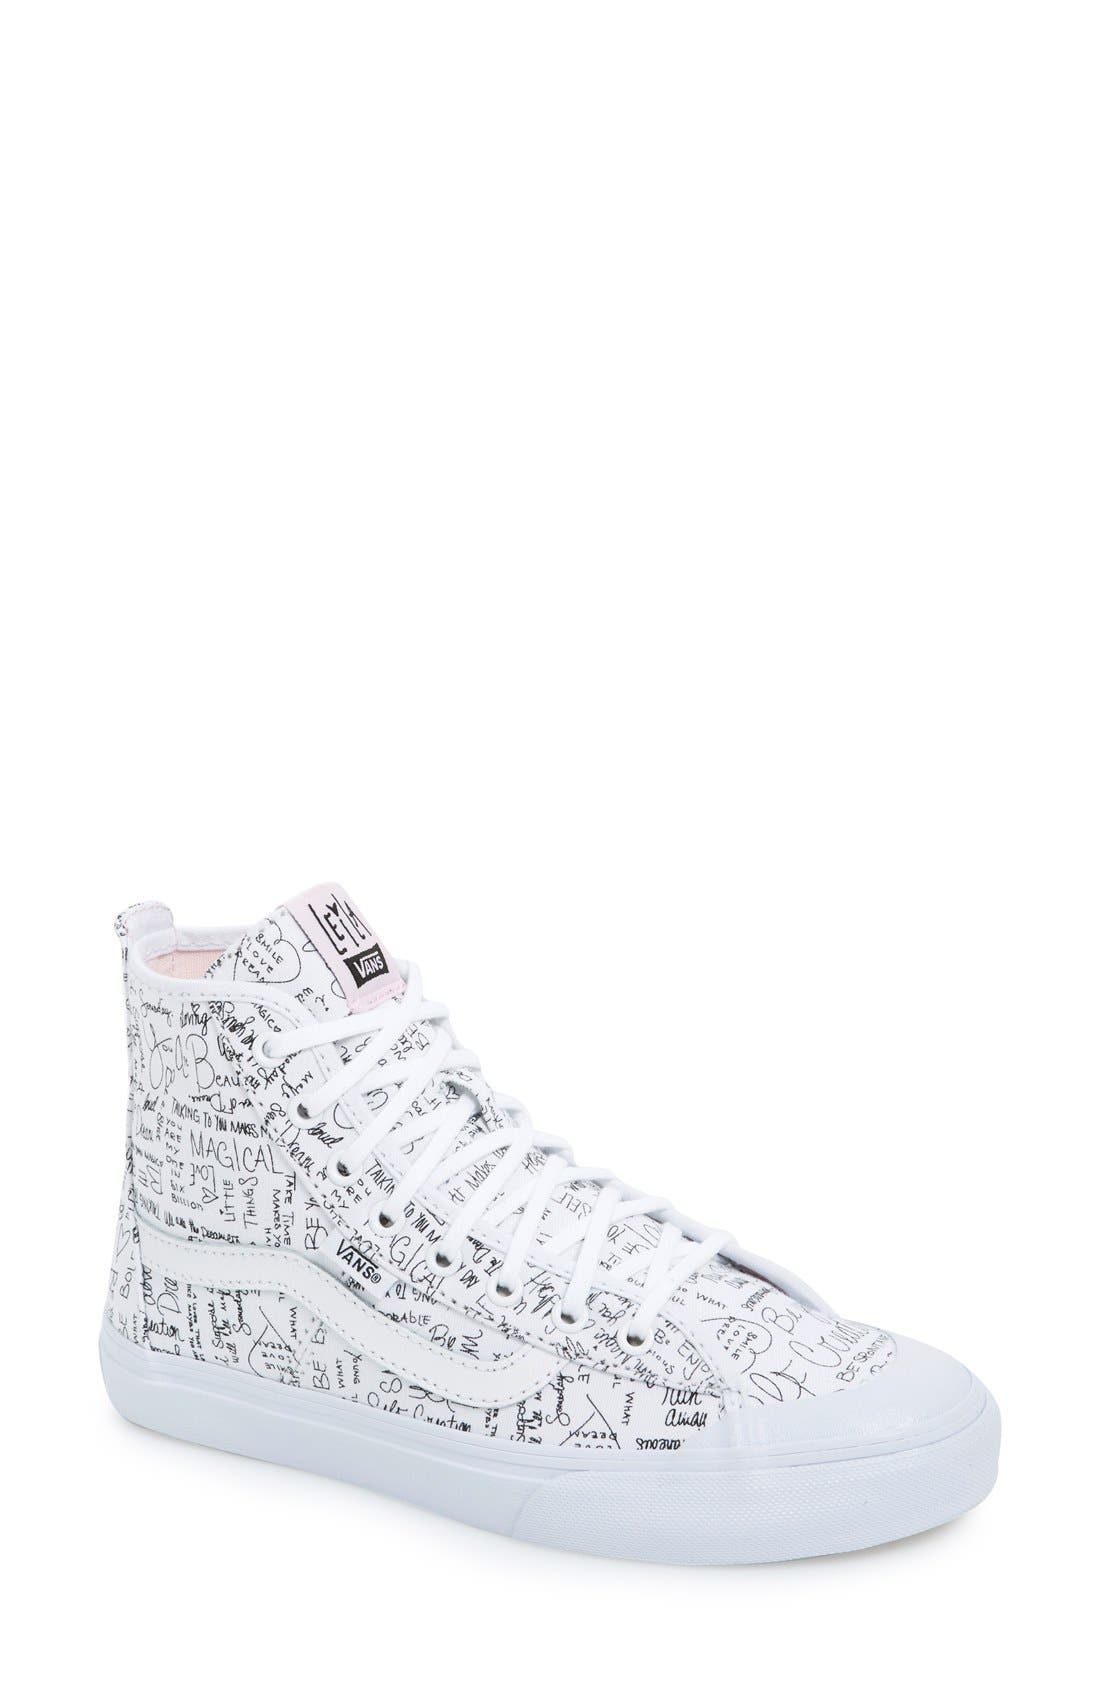 Alternate Image 1 Selected - Vans 'Dazie-Hi' Sneaker (Women)